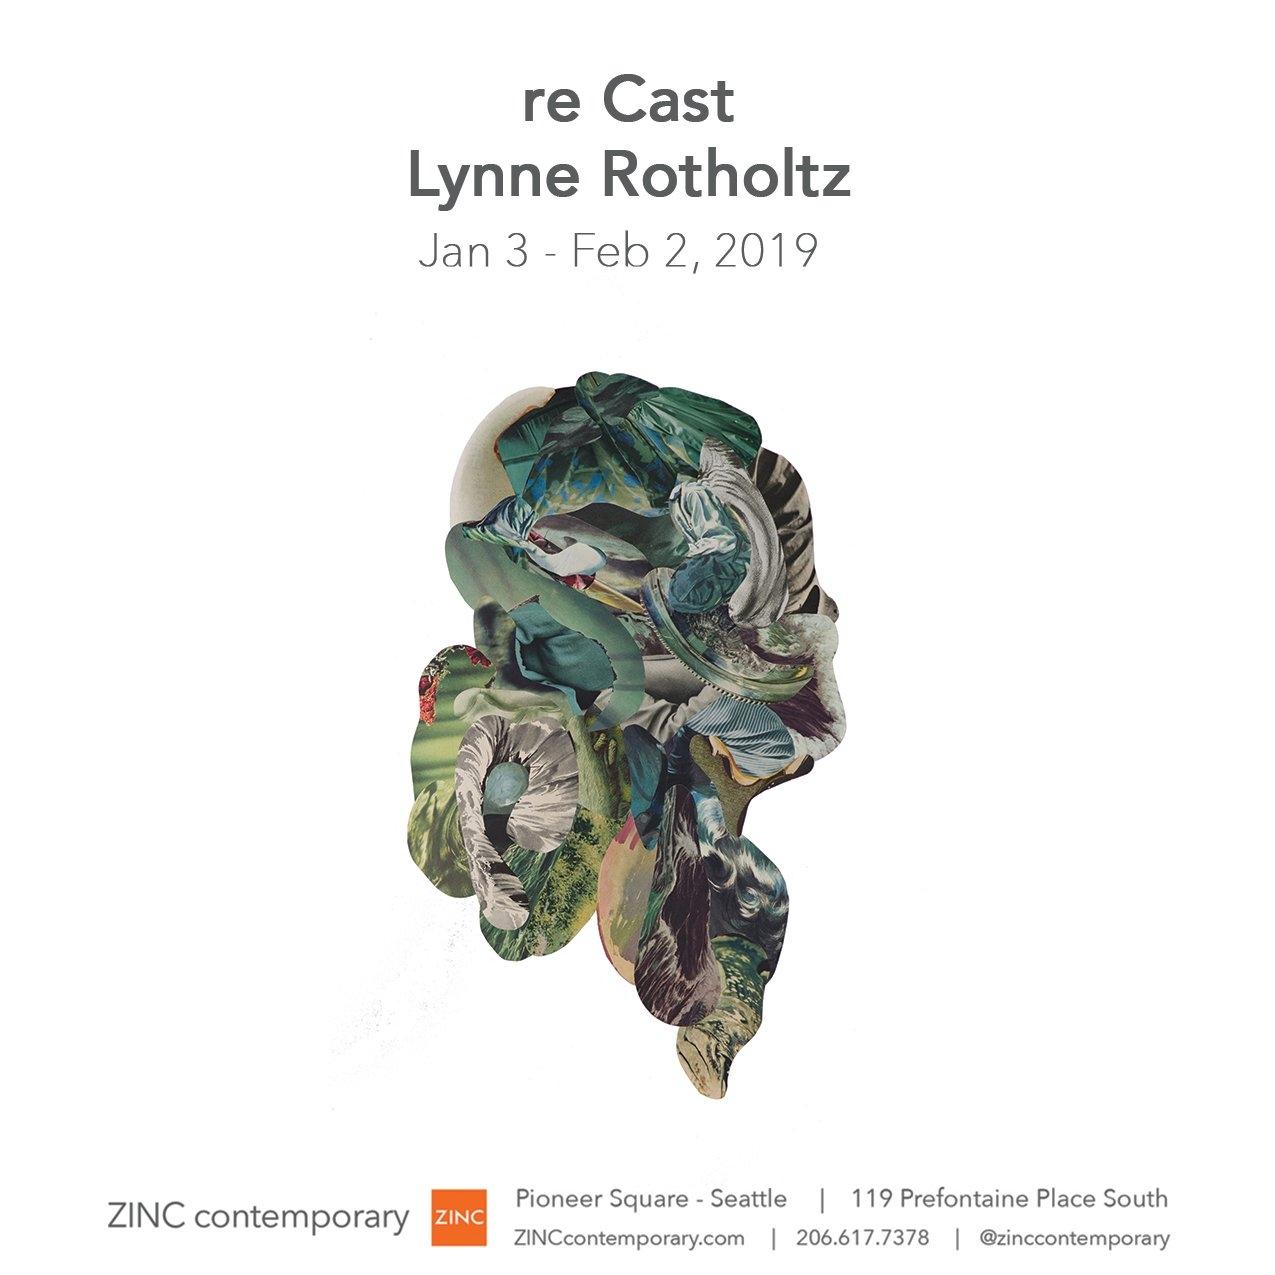 Re Castlynne Rotholtz Presentedzinc Contemporary - Seattle Seattle U Calendar 2019